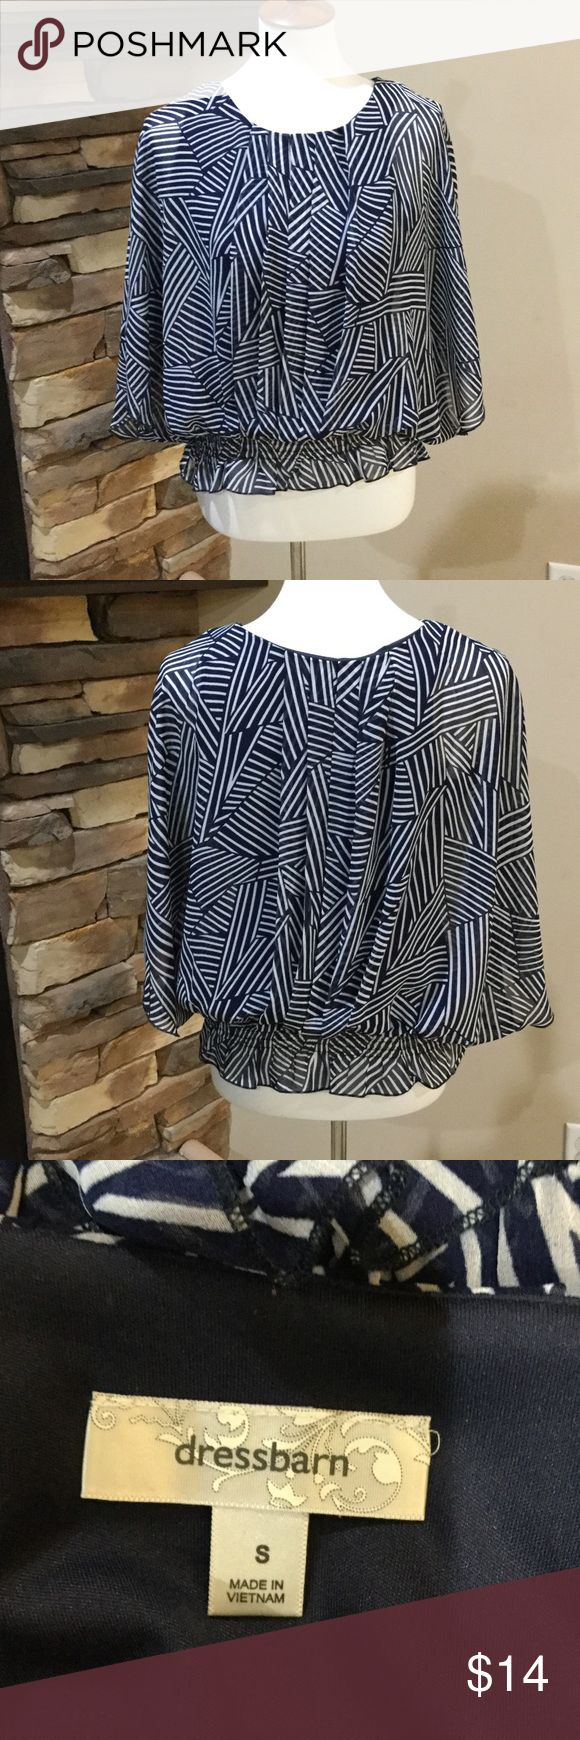 Dress Barn Blouse Navy blue and white short sleeve pullover.  Lightweight elastic waistband. Dress Barn Tops Blouses